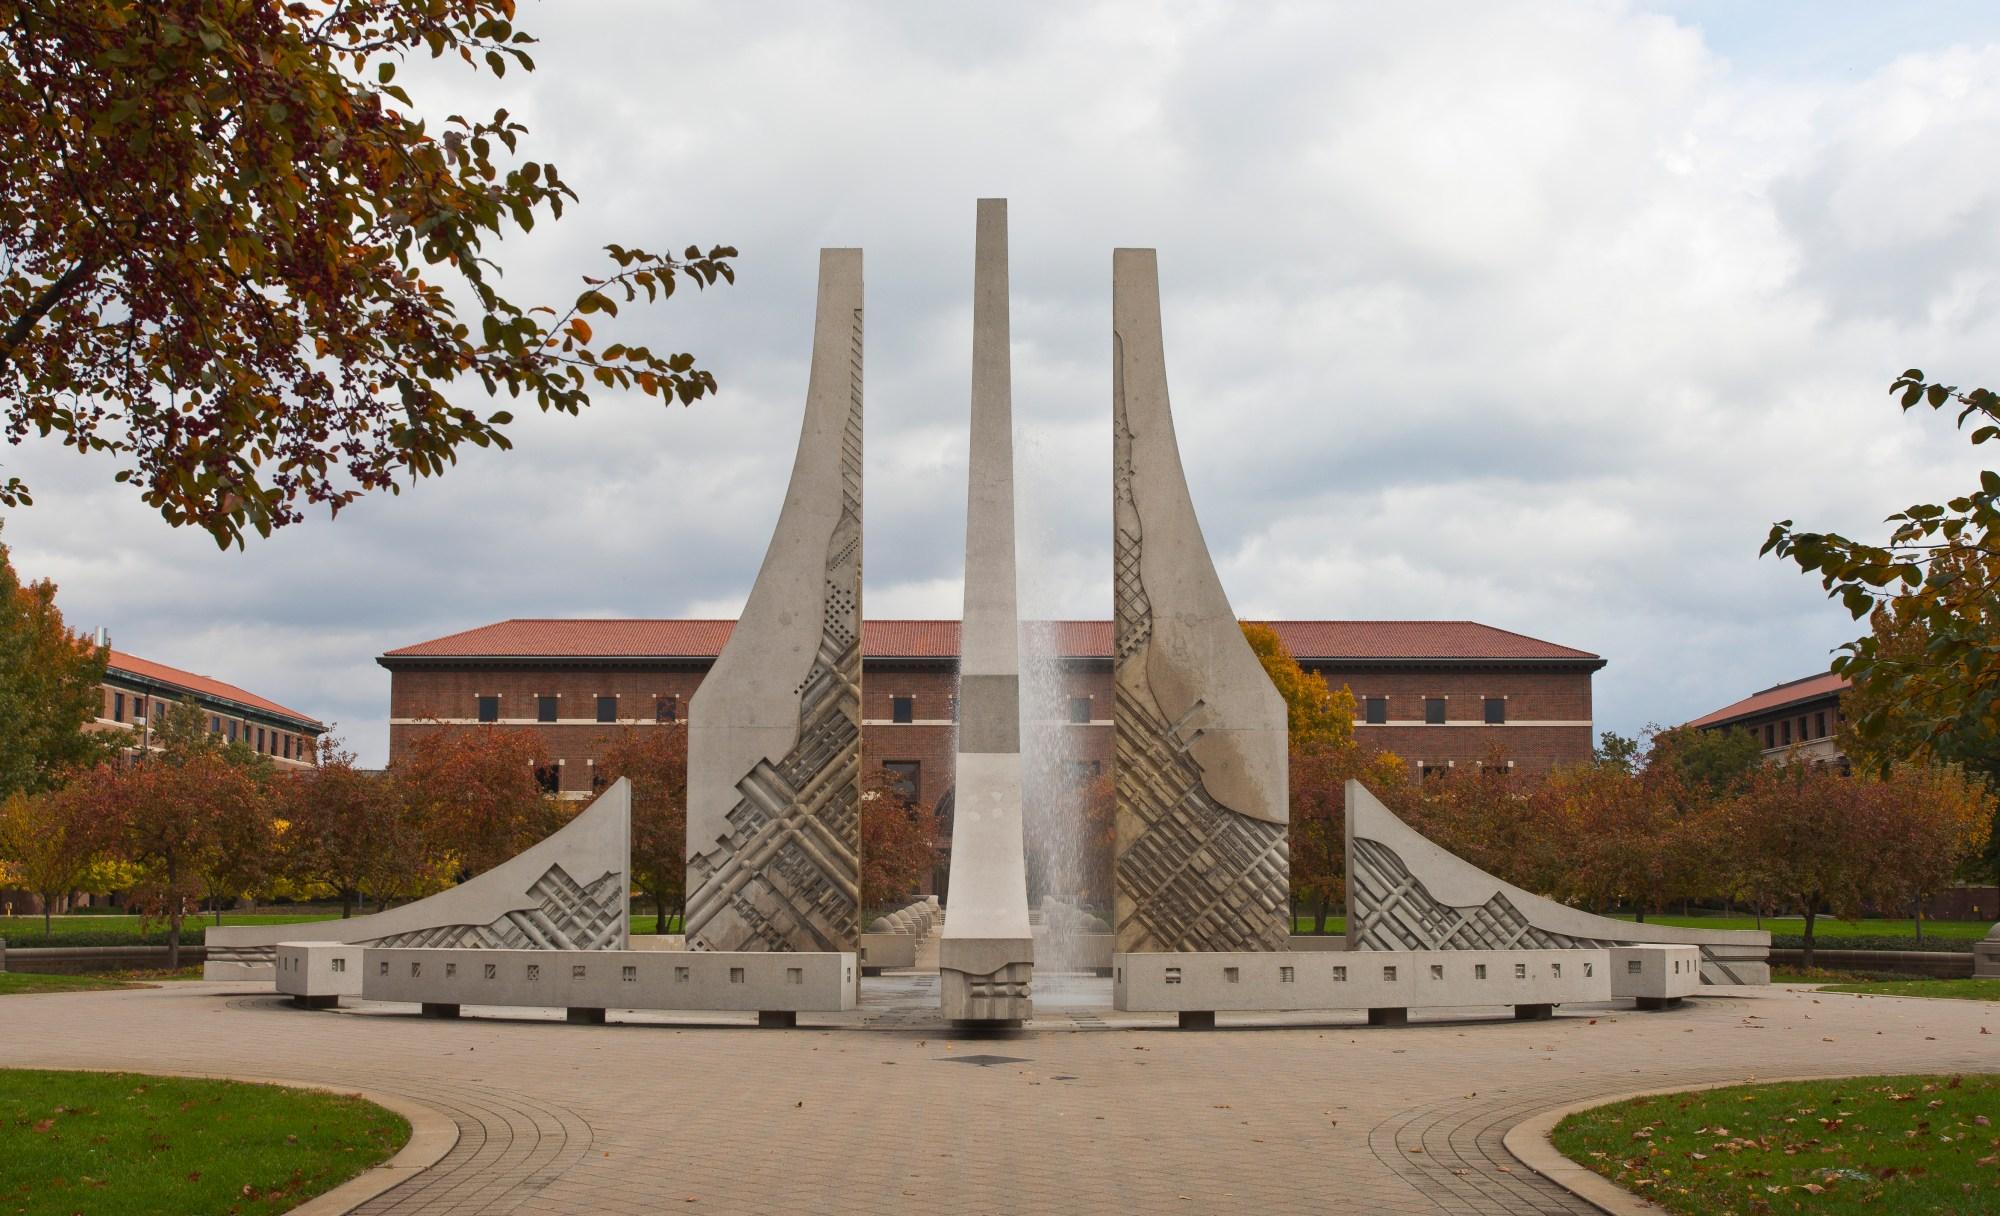 hight resolution of file purdue university west lafayette indiana estados unidos 2012 10 15 dd 19 jpg